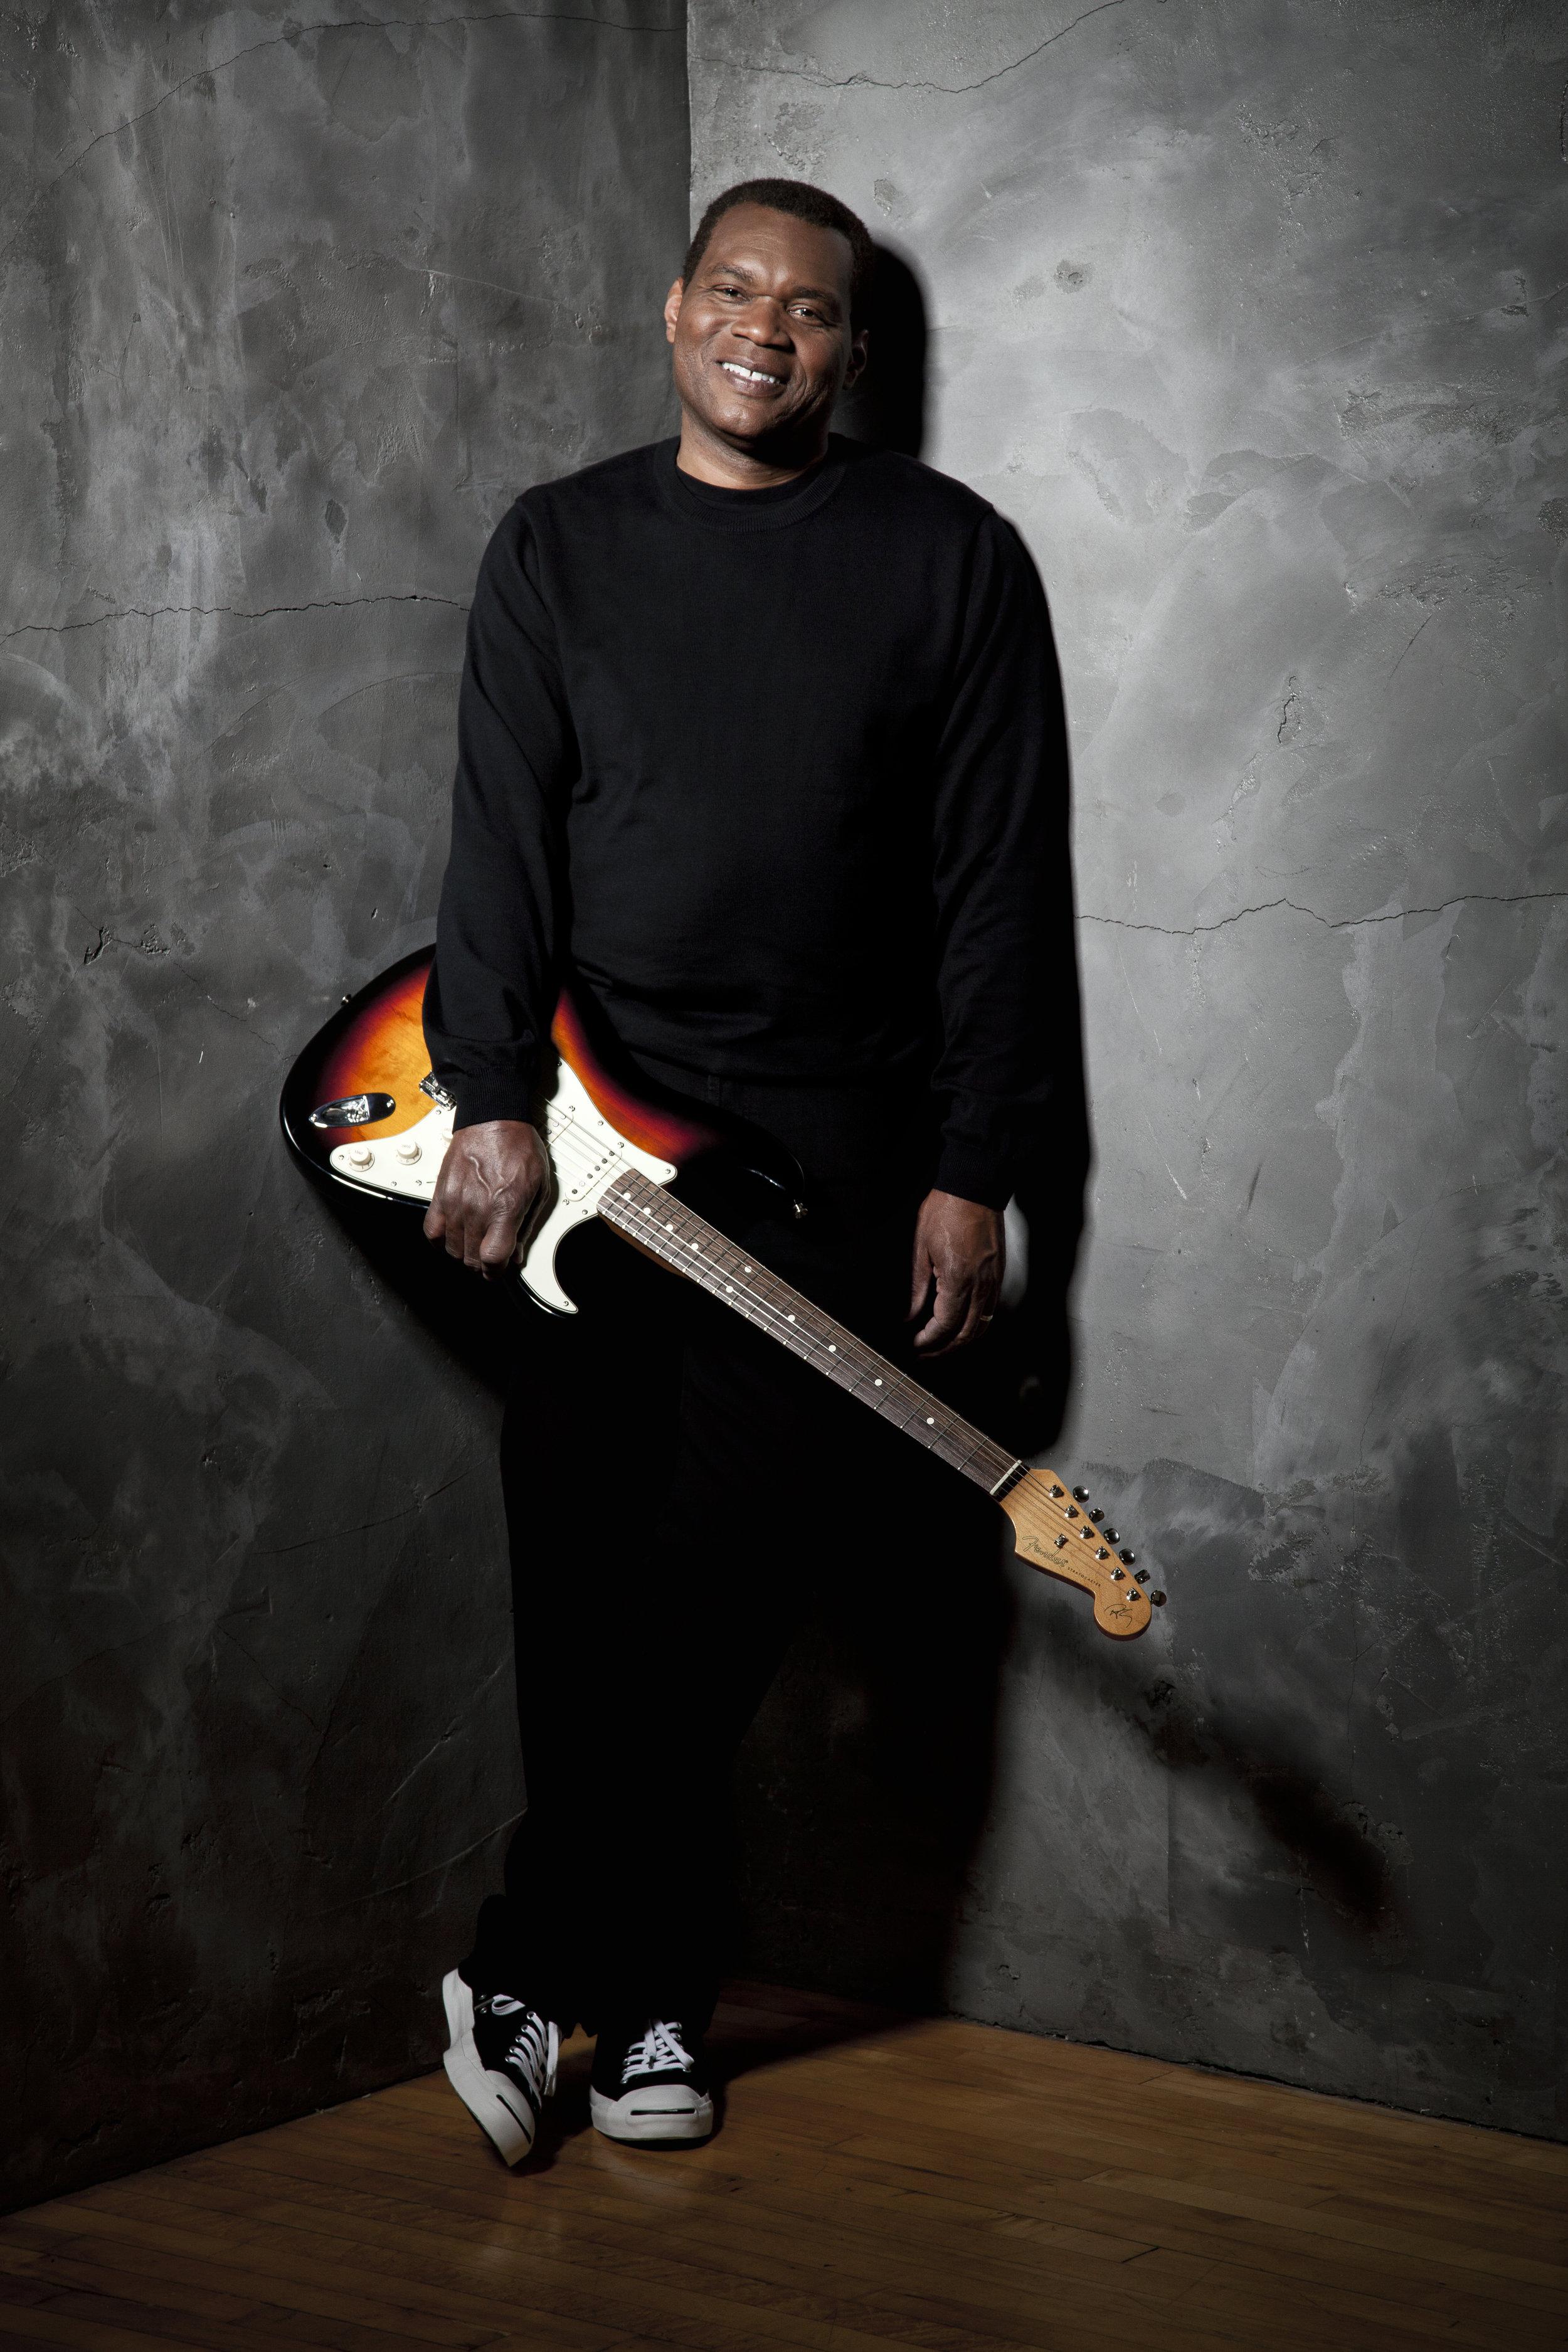 The Robert Cray Band | Tarrytown Music Hall | 8.11.17 | 8 PM